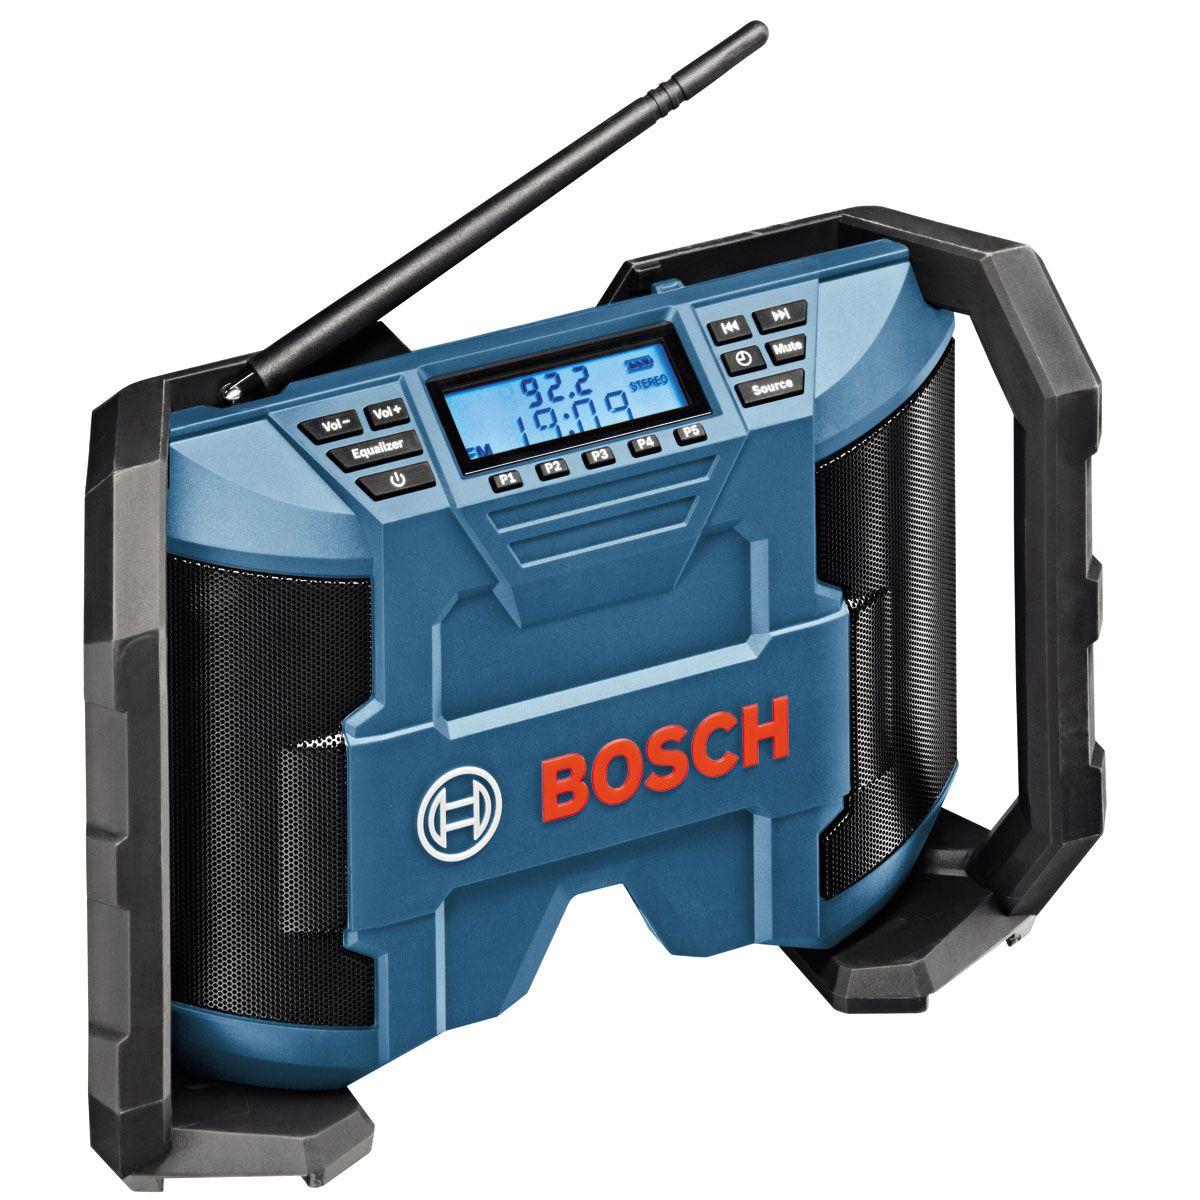 Glm10 2 Jpg 1200 1200 Bosch Site Radio Radio